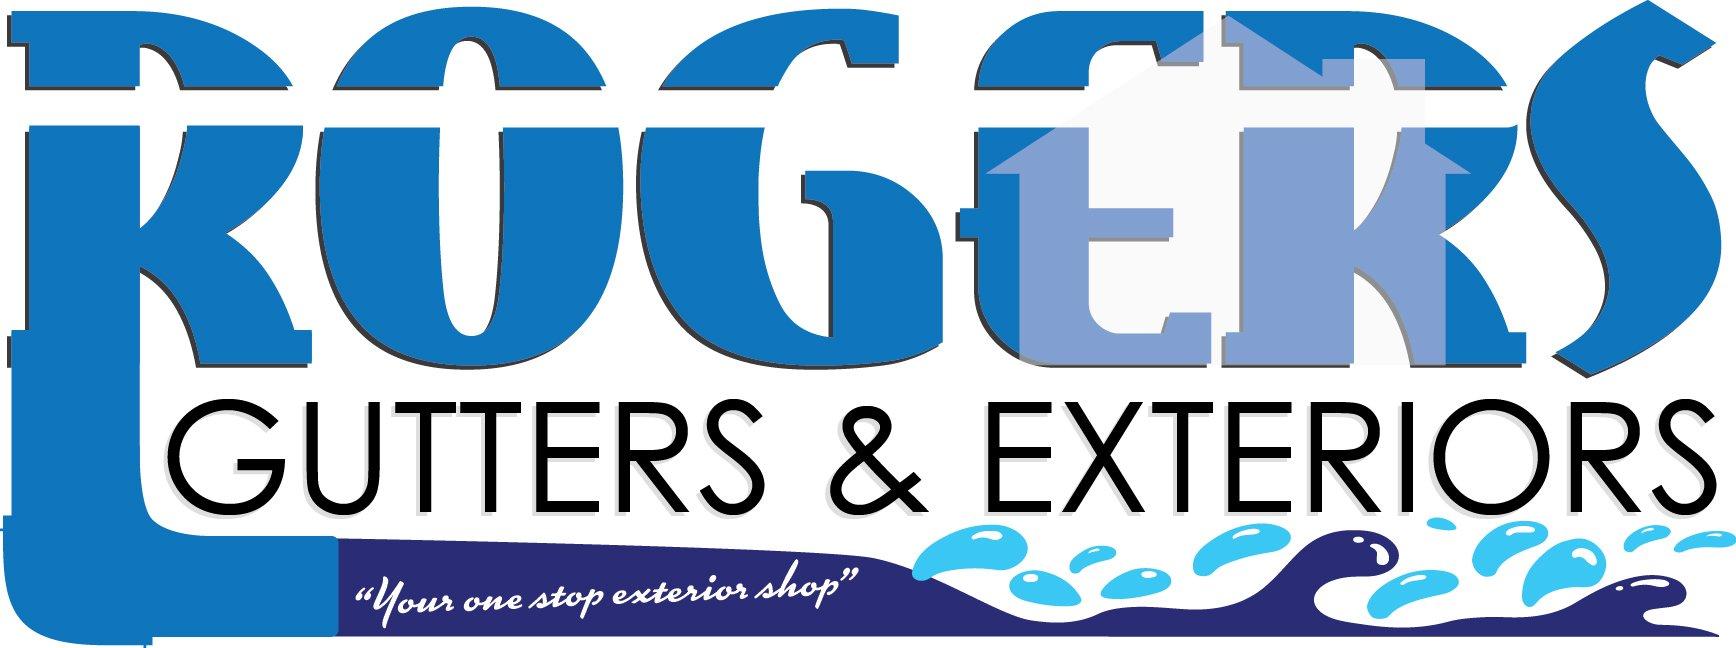 Rogers Gutters & Exteriors